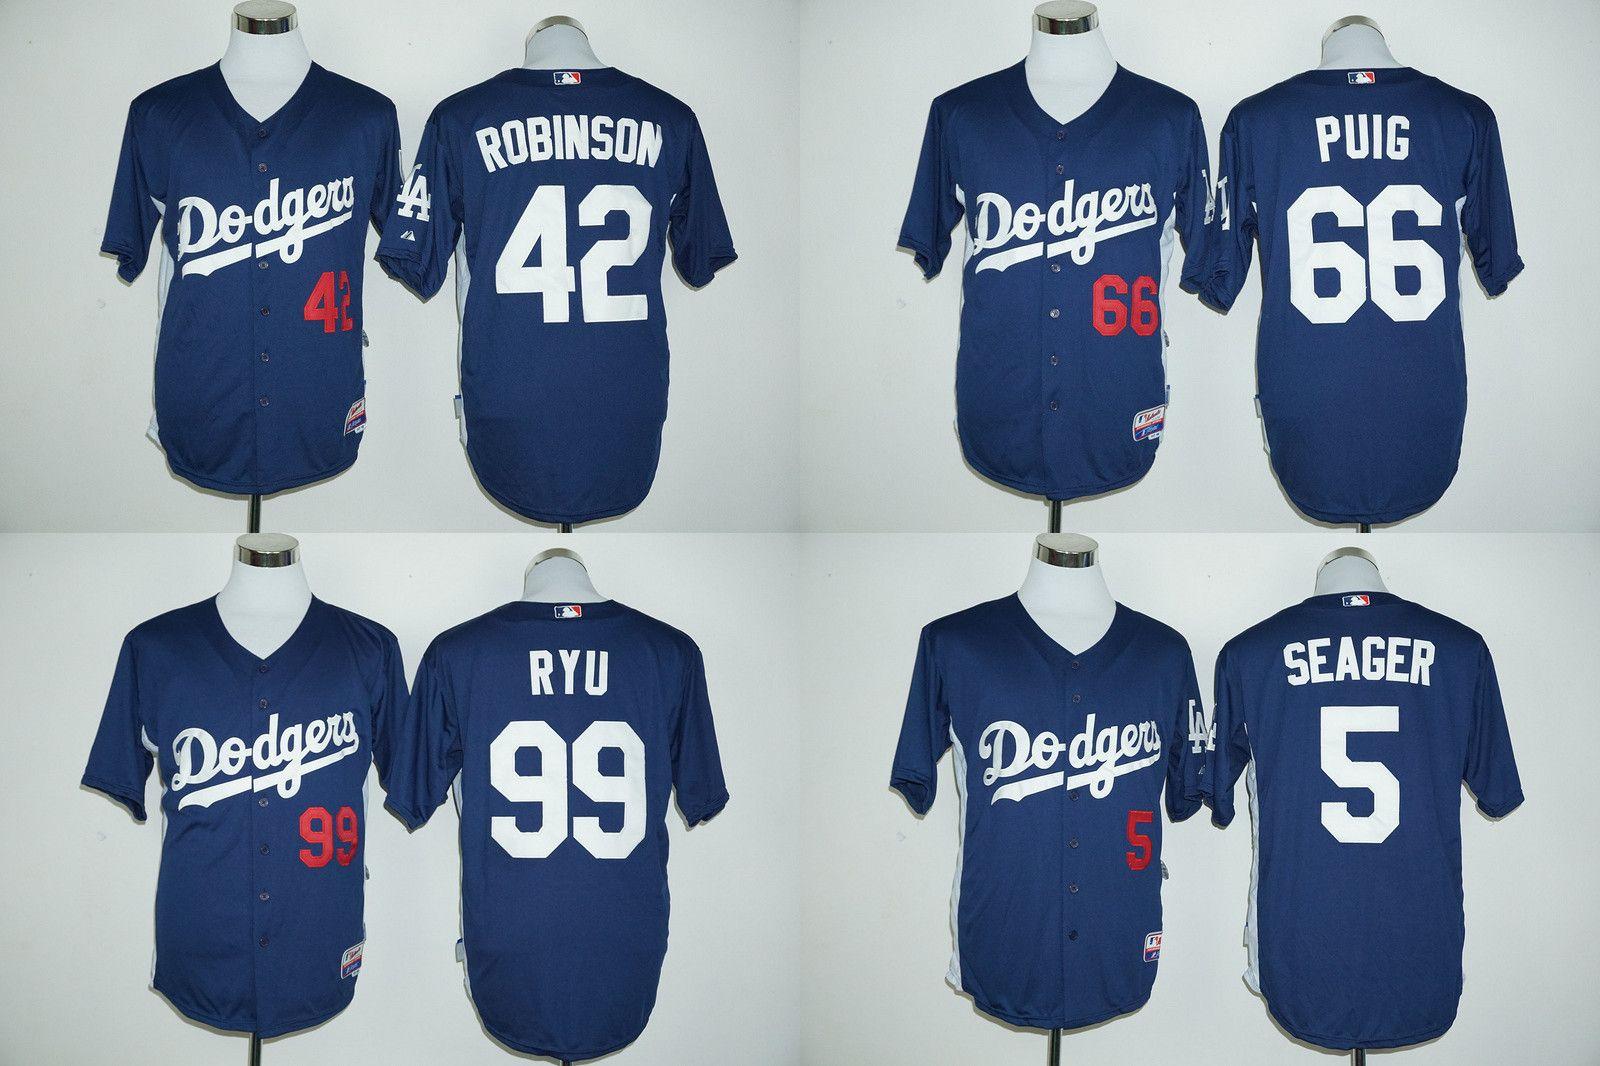 Compre Jersey De Los Ángeles Dodgers   5 Corey Seager   66 Yasiel Puig   42  Jackie Robinson   99 Jerseys De Béisbol Azules De Hyun Jin Ryu De Manga  Larga A ... 4d4301293bc